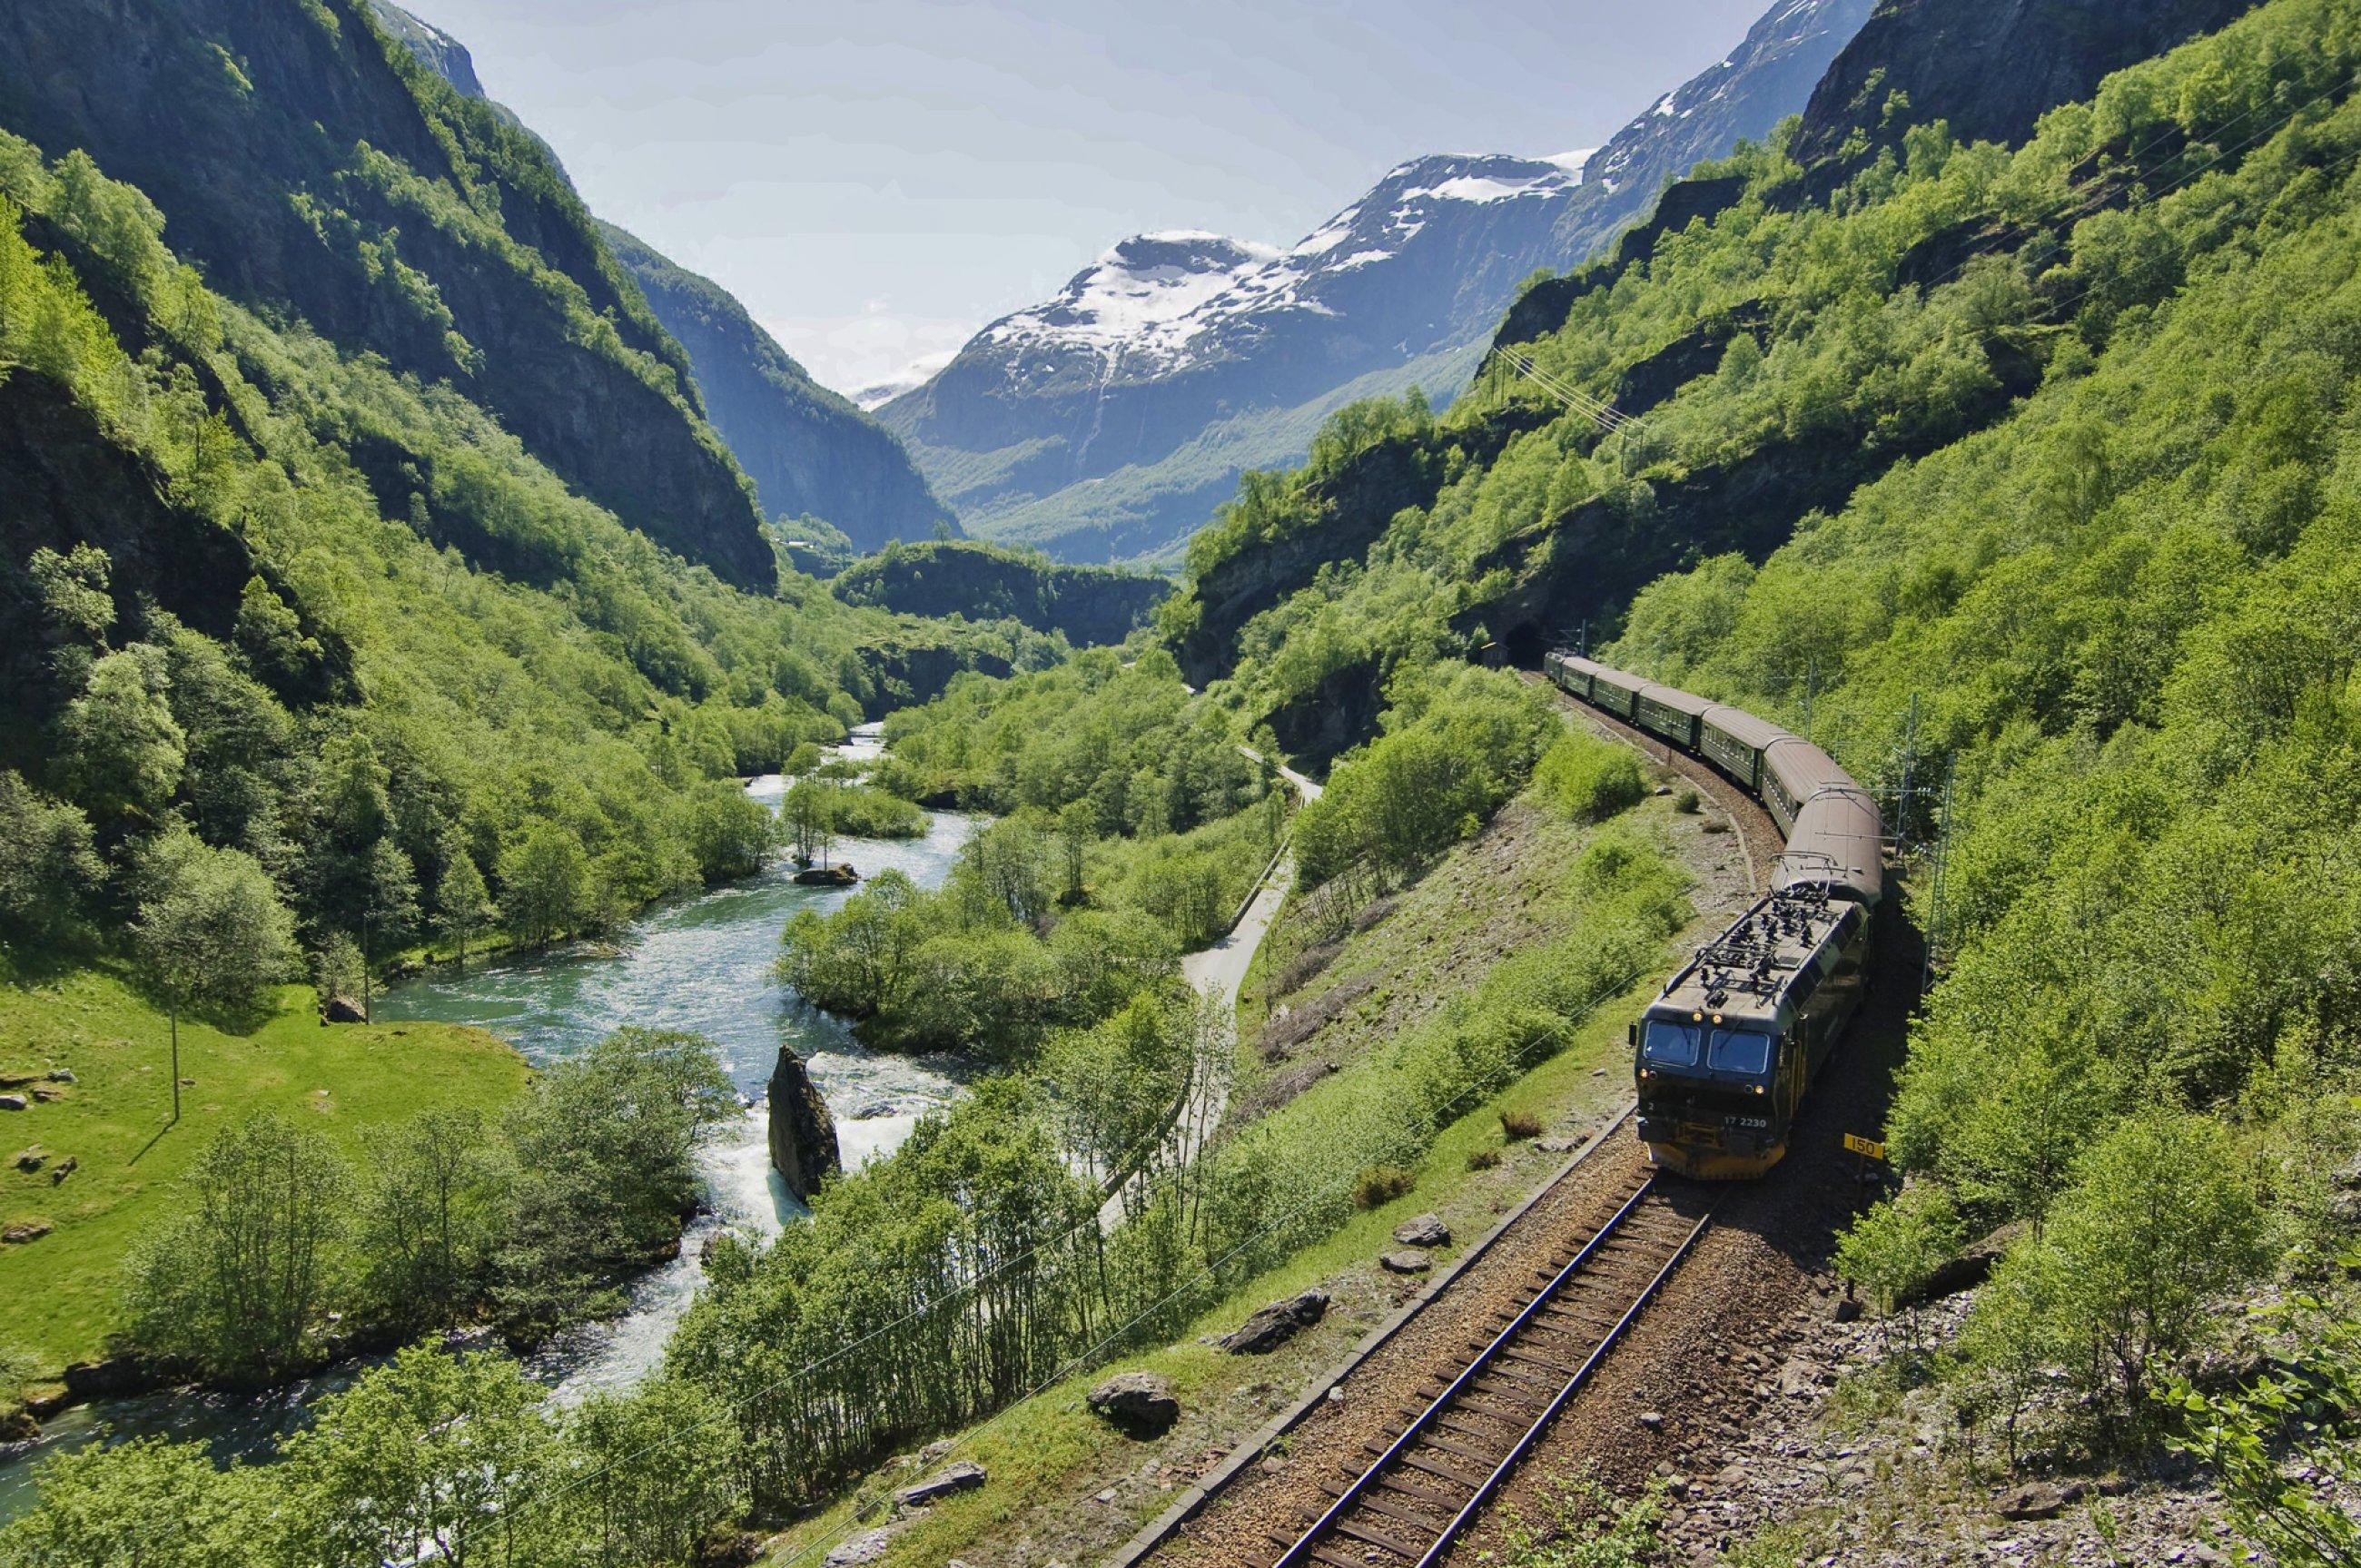 https://bubo.sk/uploads/galleries/7531/fl-m-railway-terje-rakke-nordic-life-as-fjord-norw.jpg